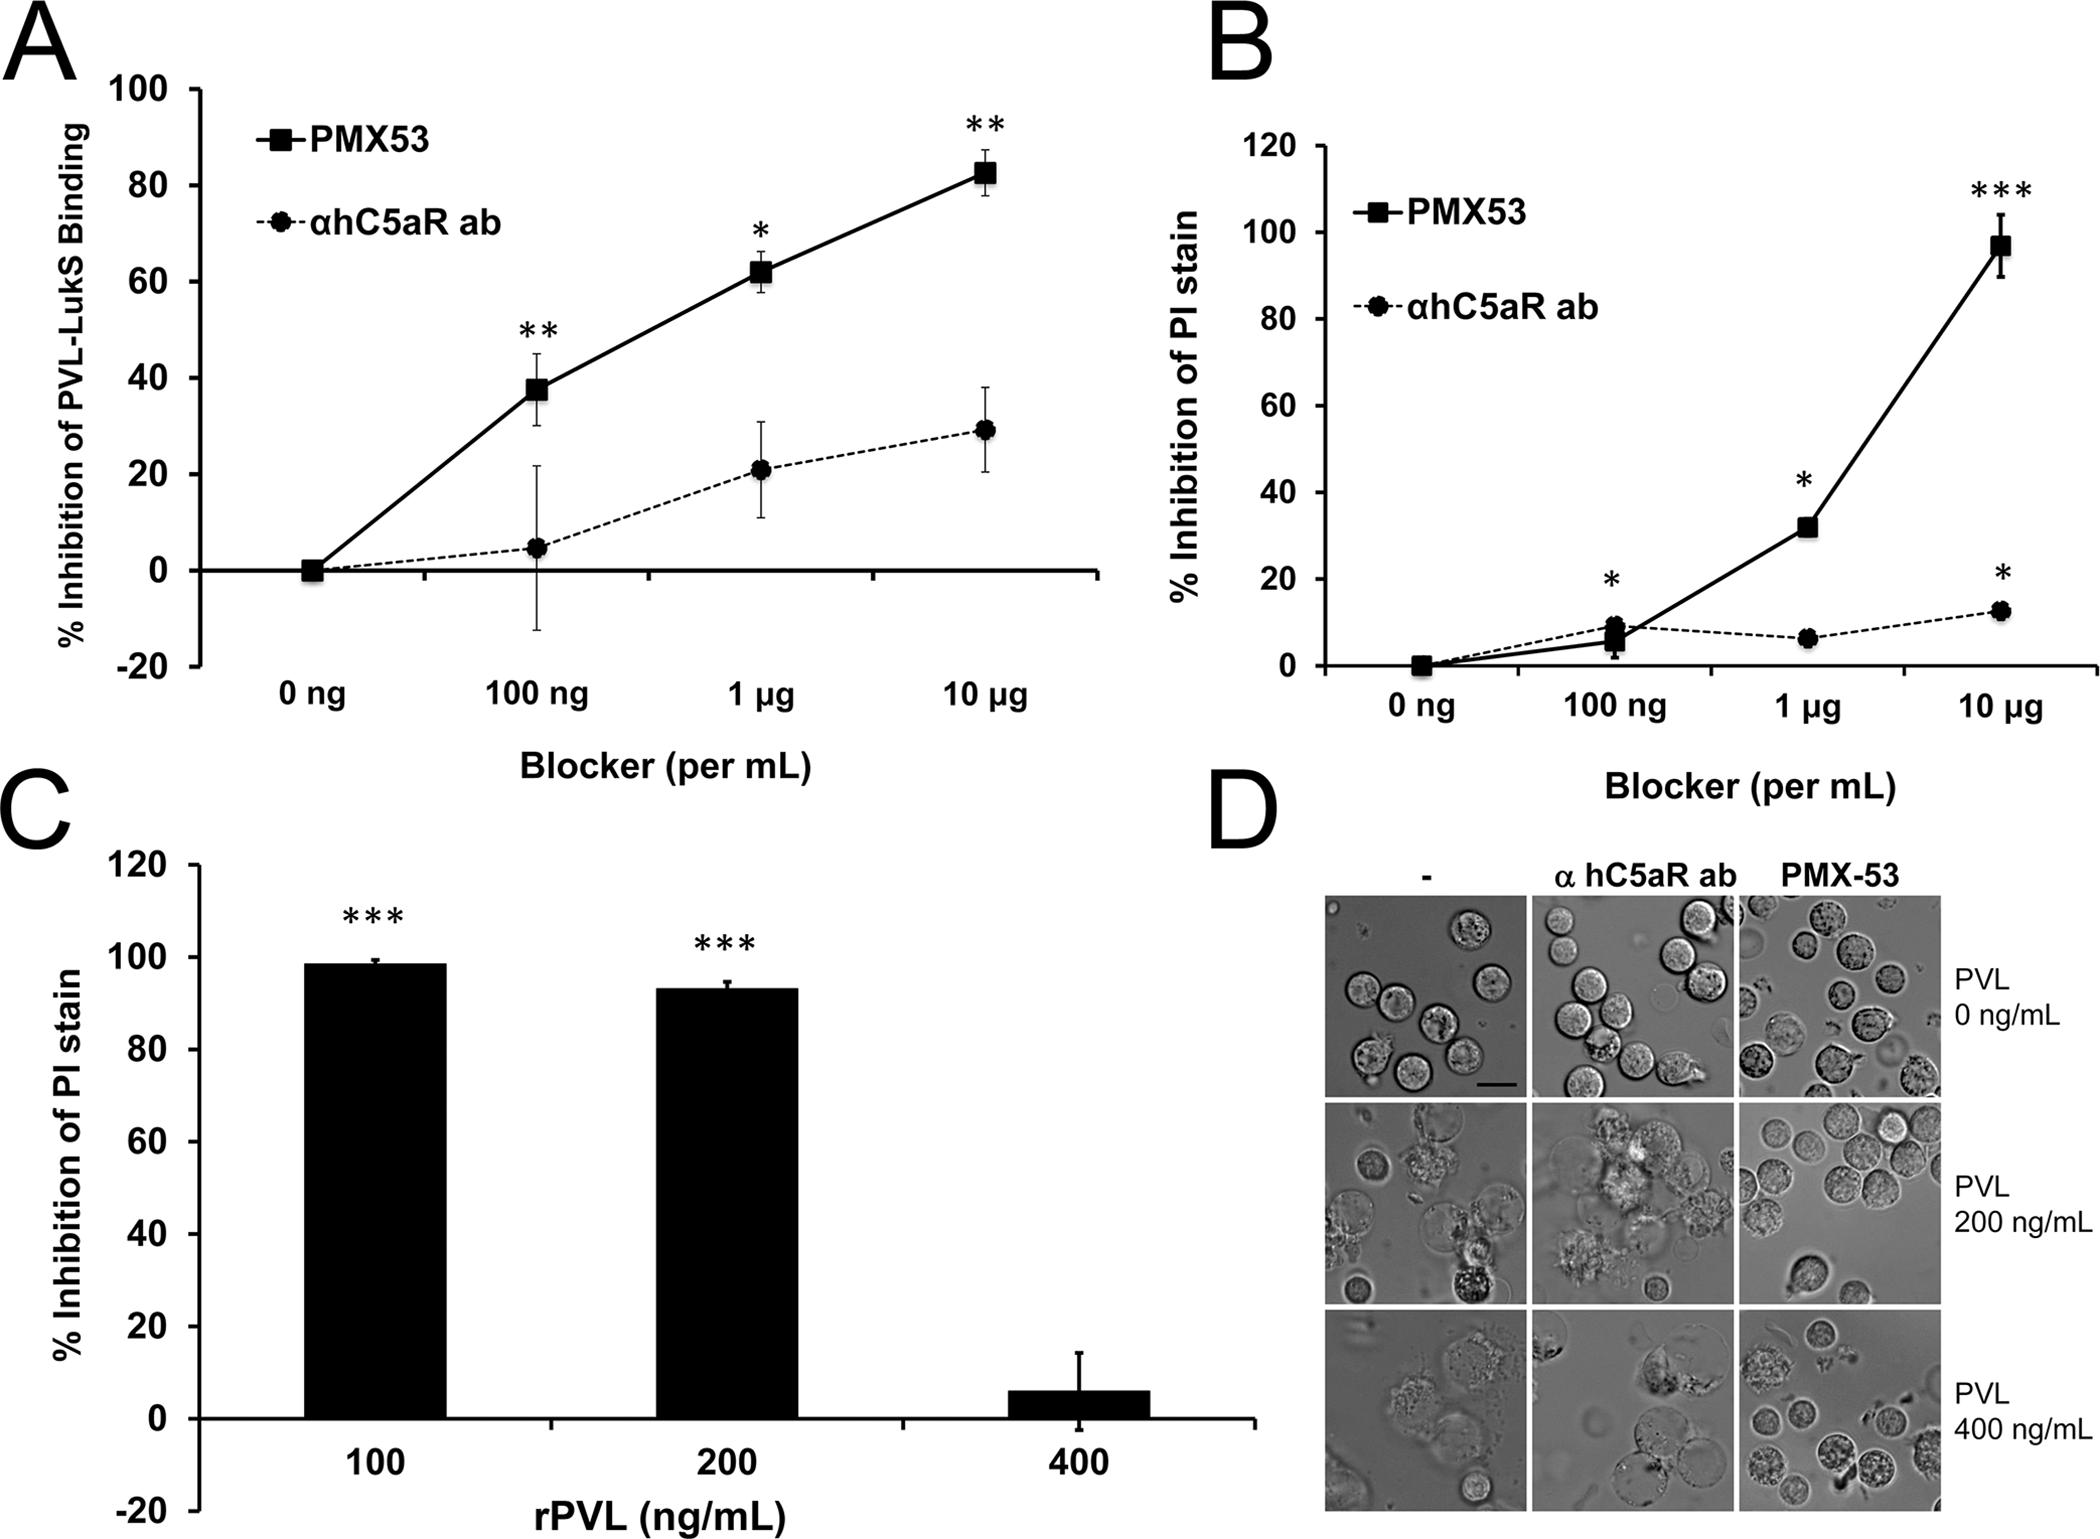 PMX53 inhibits PVL-mediated pore formation and cytotoxicity <i>in vitro</i>.